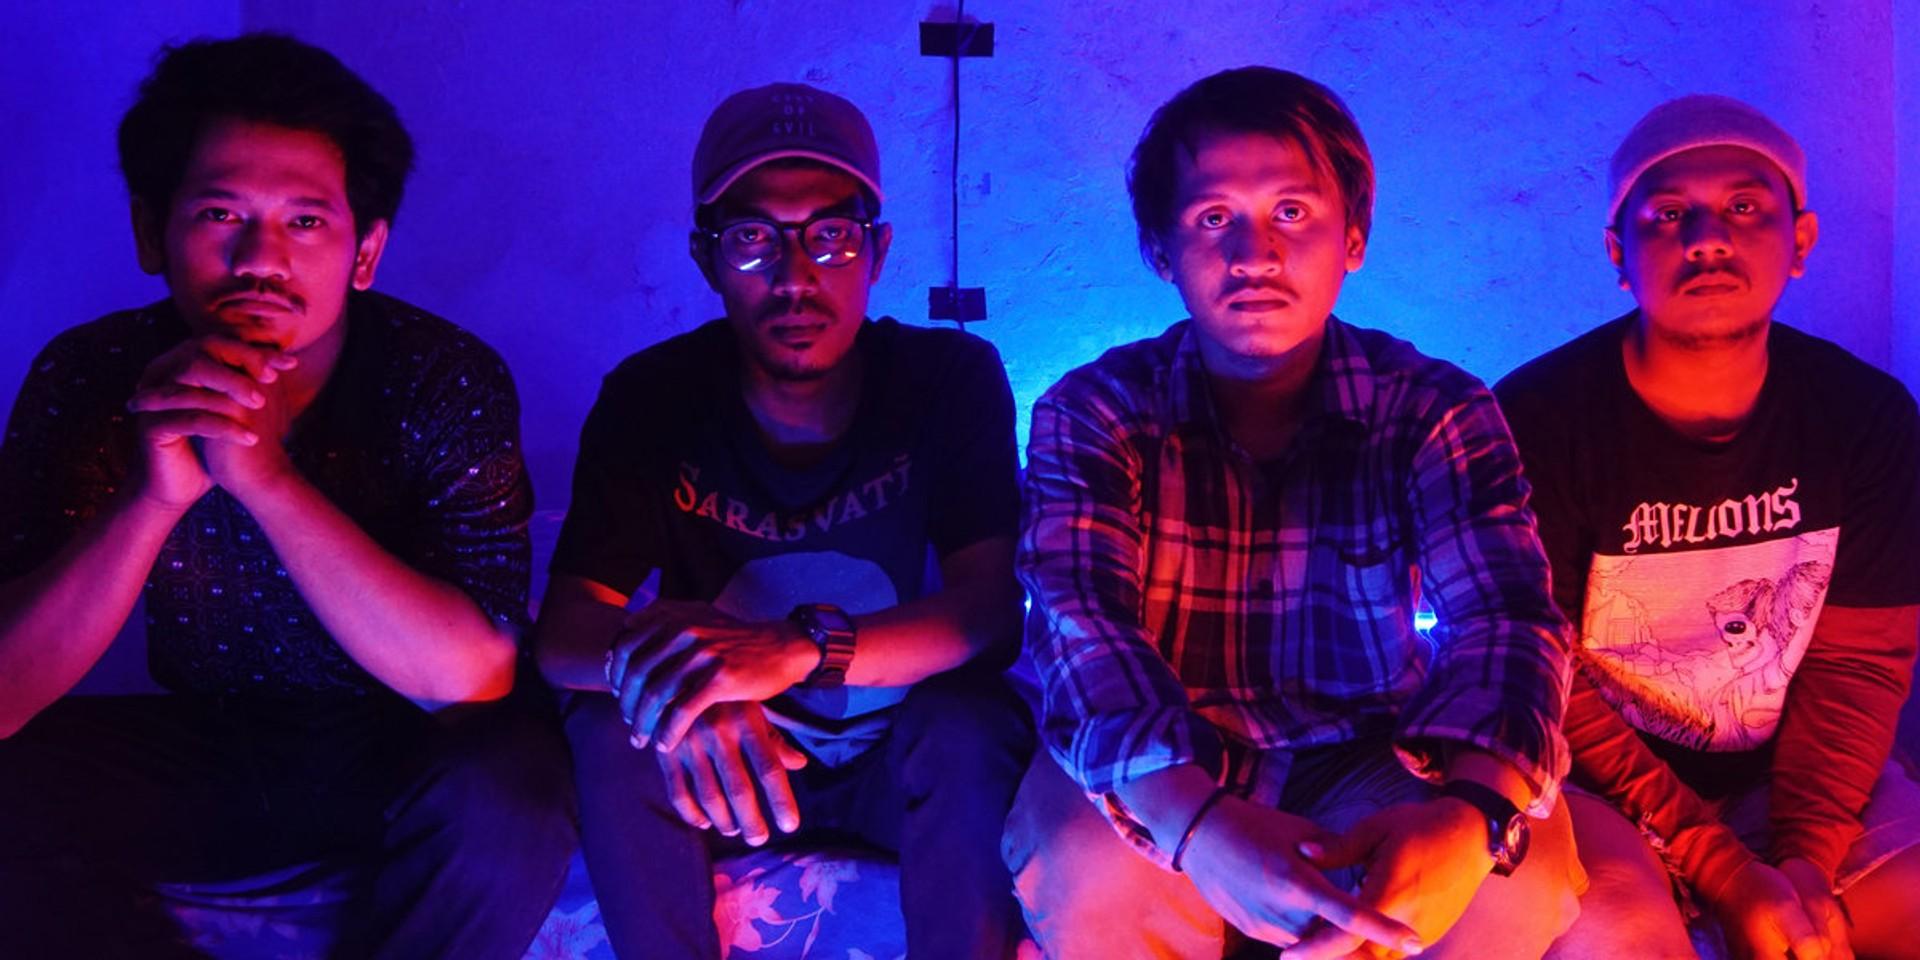 Indonesian shoegaze band Rissau announces Southeast Asia tour – Singapore, Kuala Lumpur, Batam and more confirmed